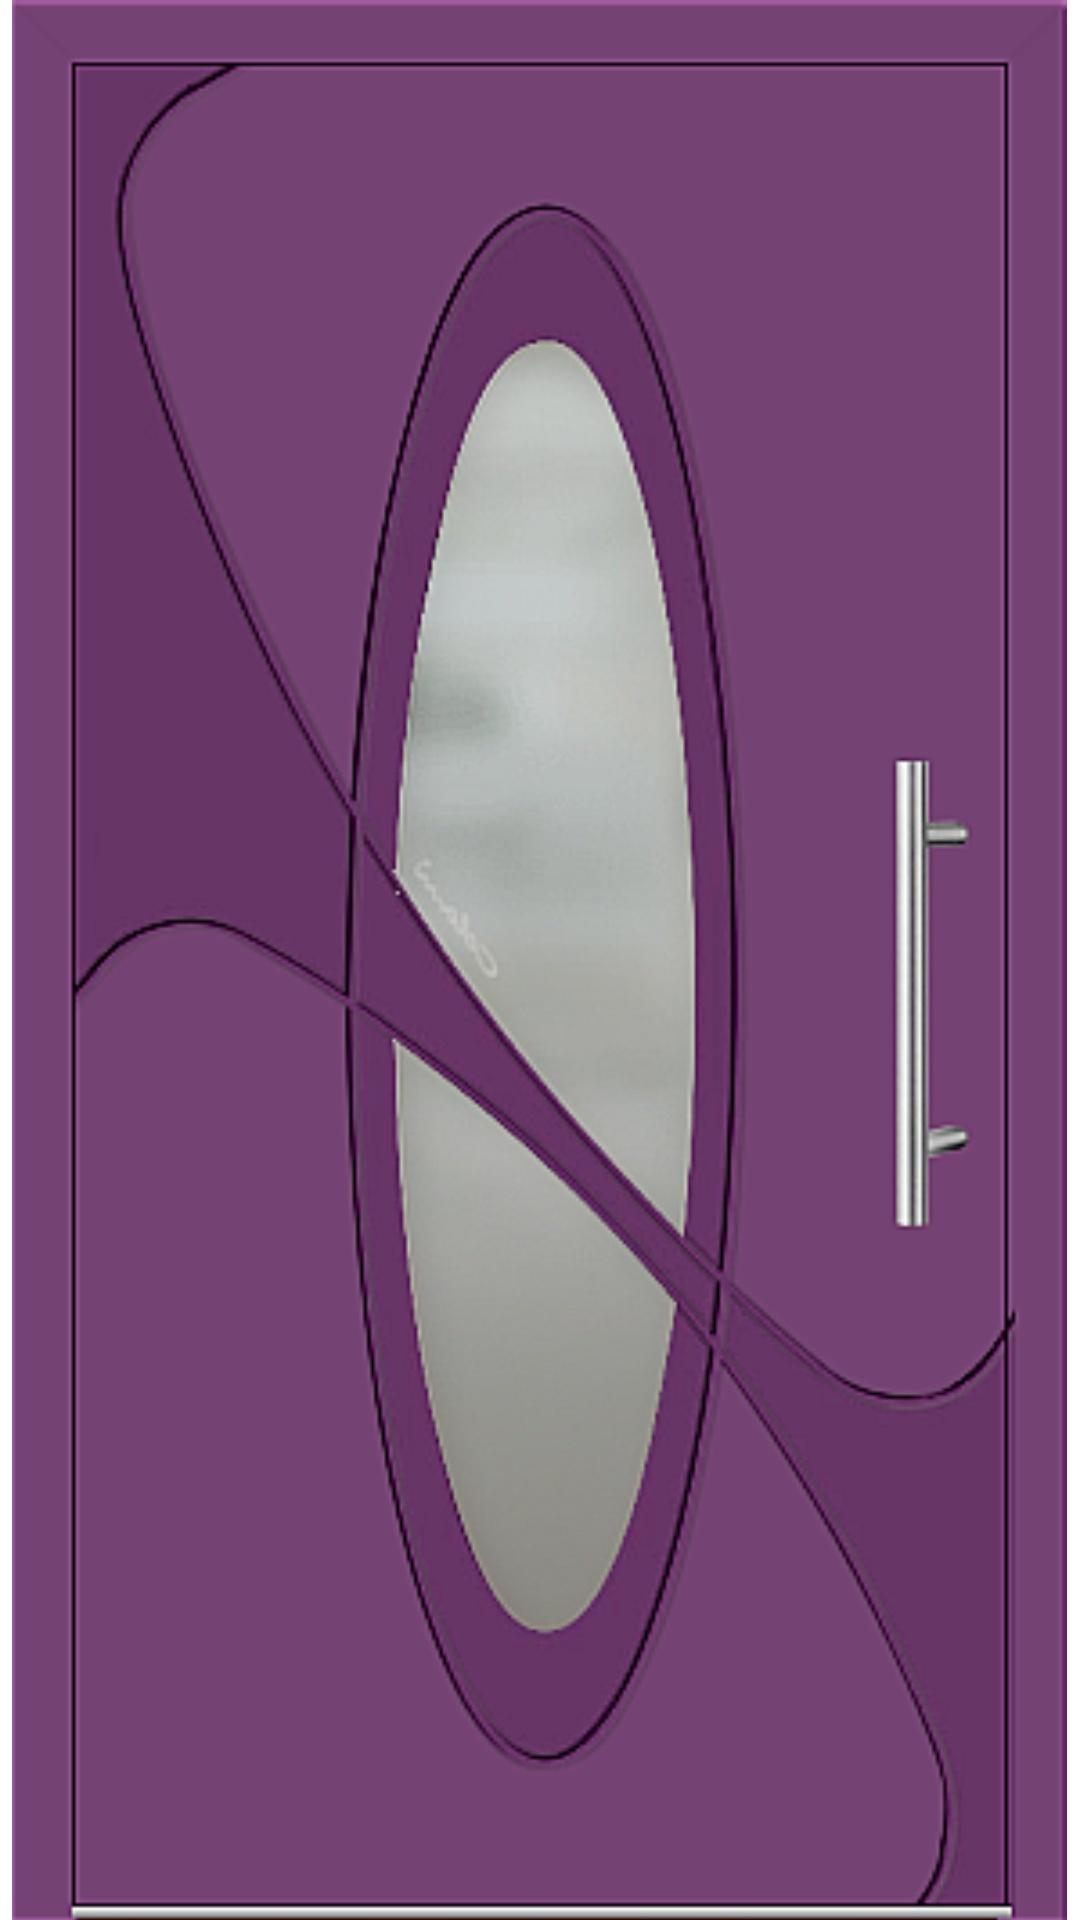 Aluminium Haustür Modell 6990-41 singalviolett